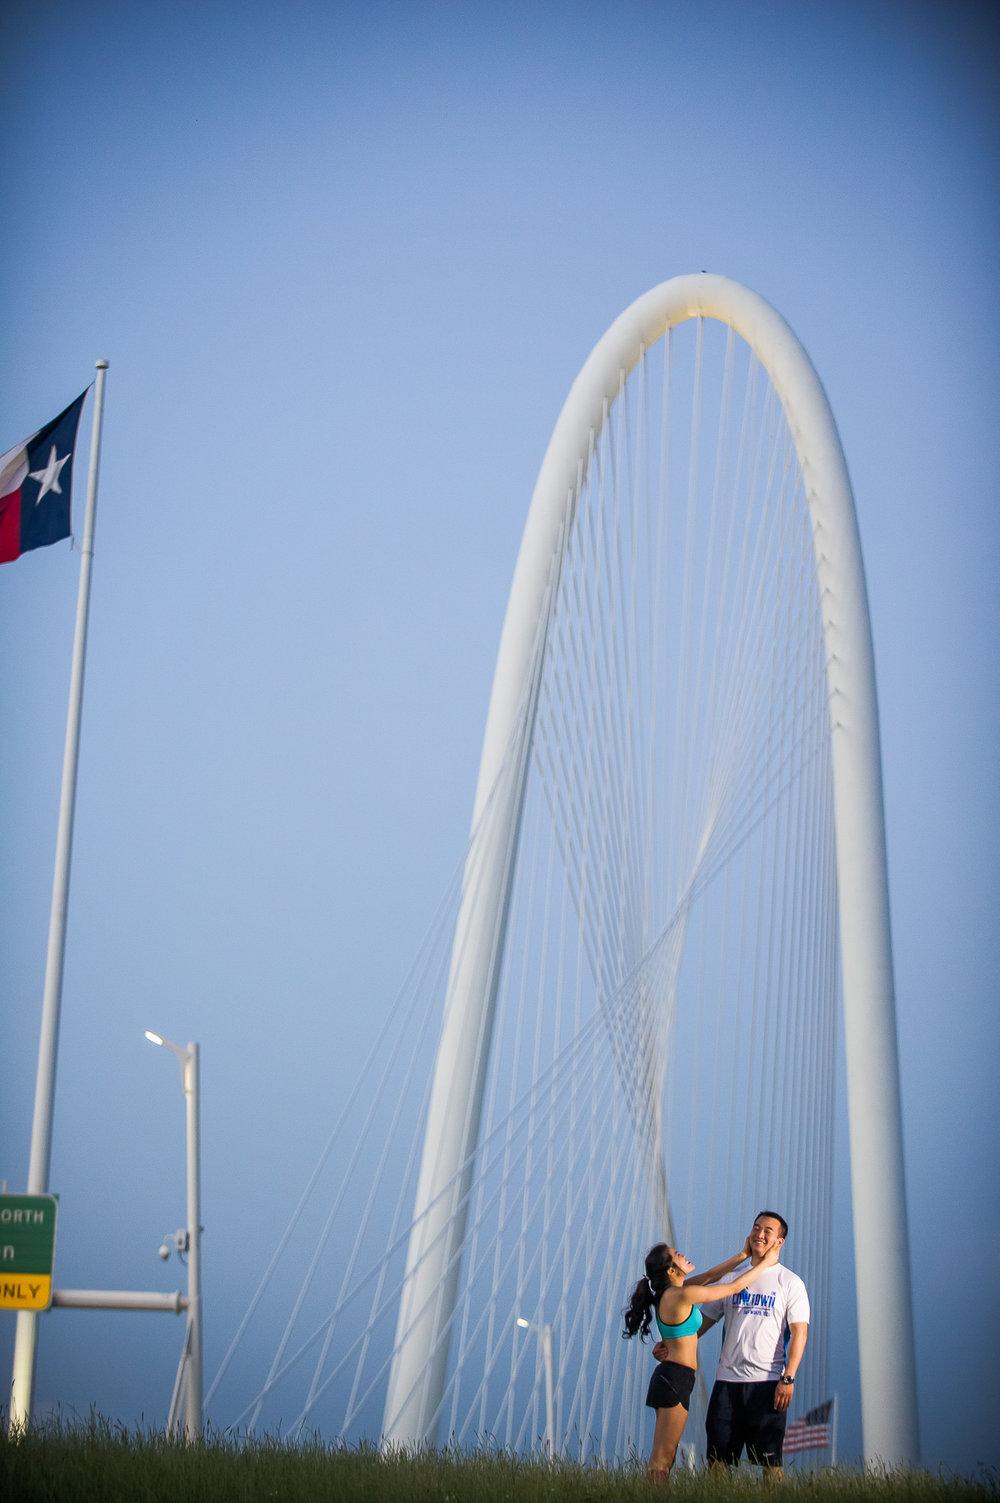 103-David Loi Studios - Dallas Texas - DFW - One Arts Plaza-16173.jpg